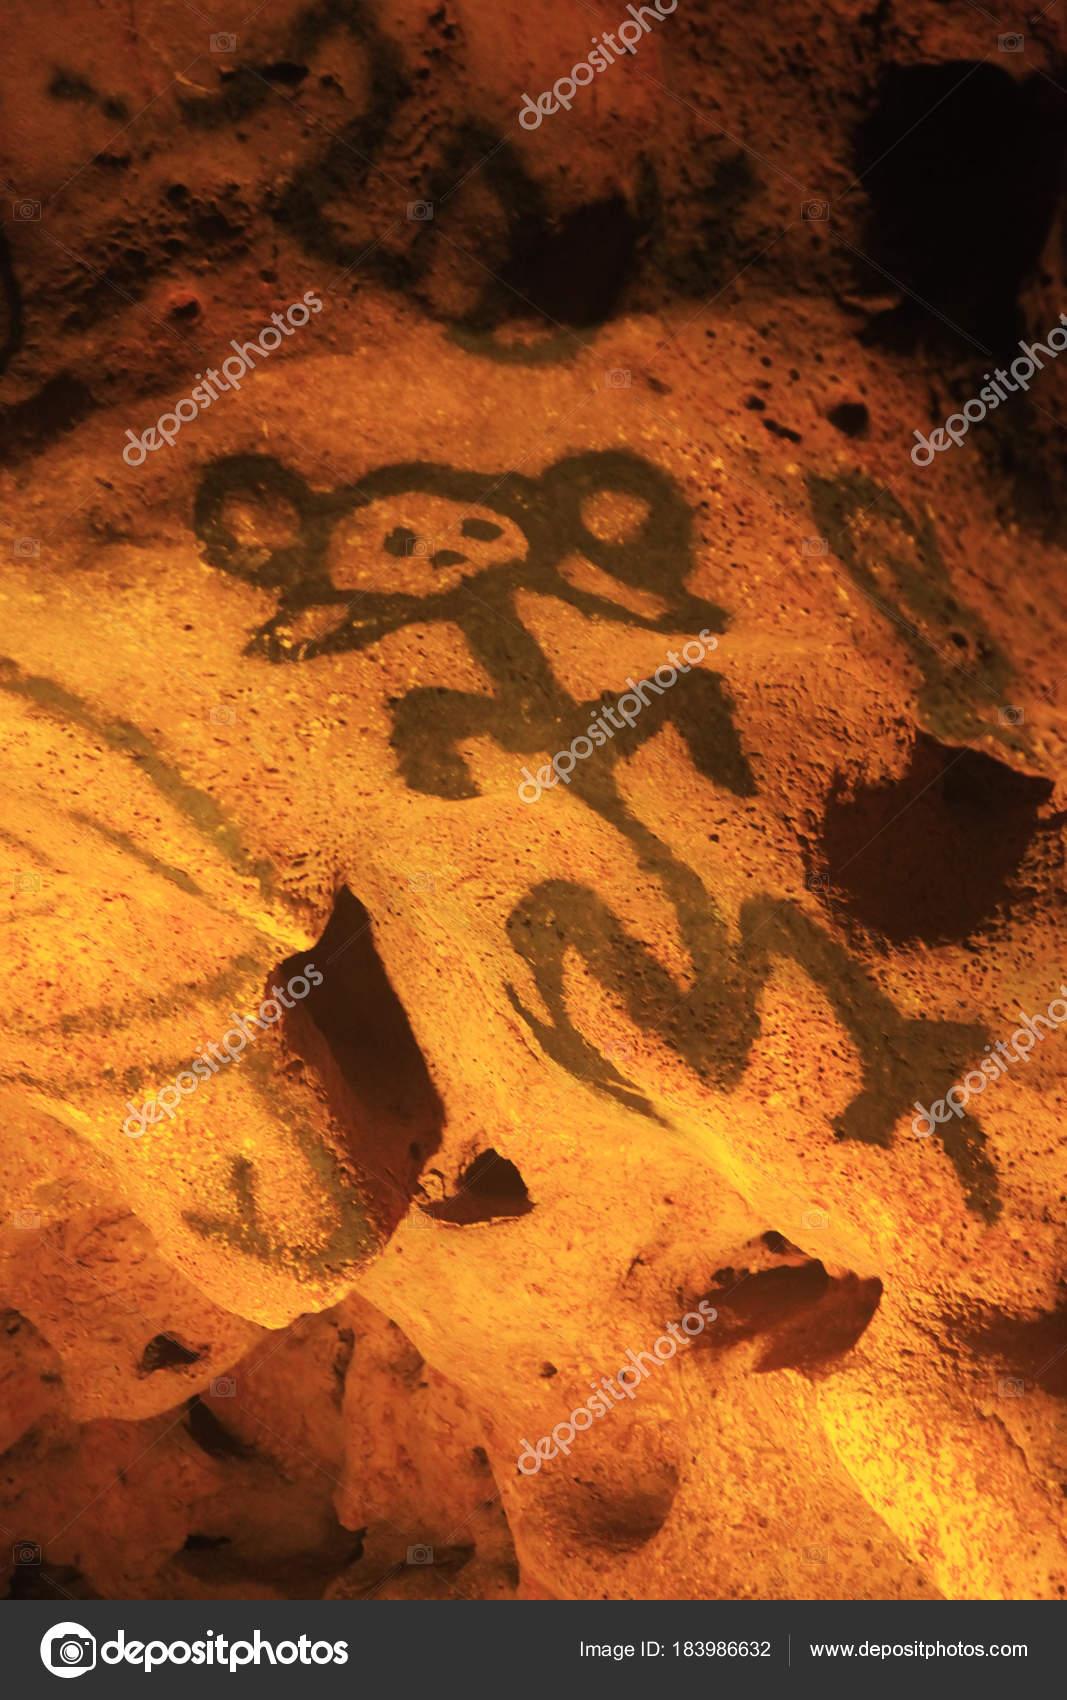 Jeskyne S Staroveke Kresby Cueva De Las Maravillas Stock